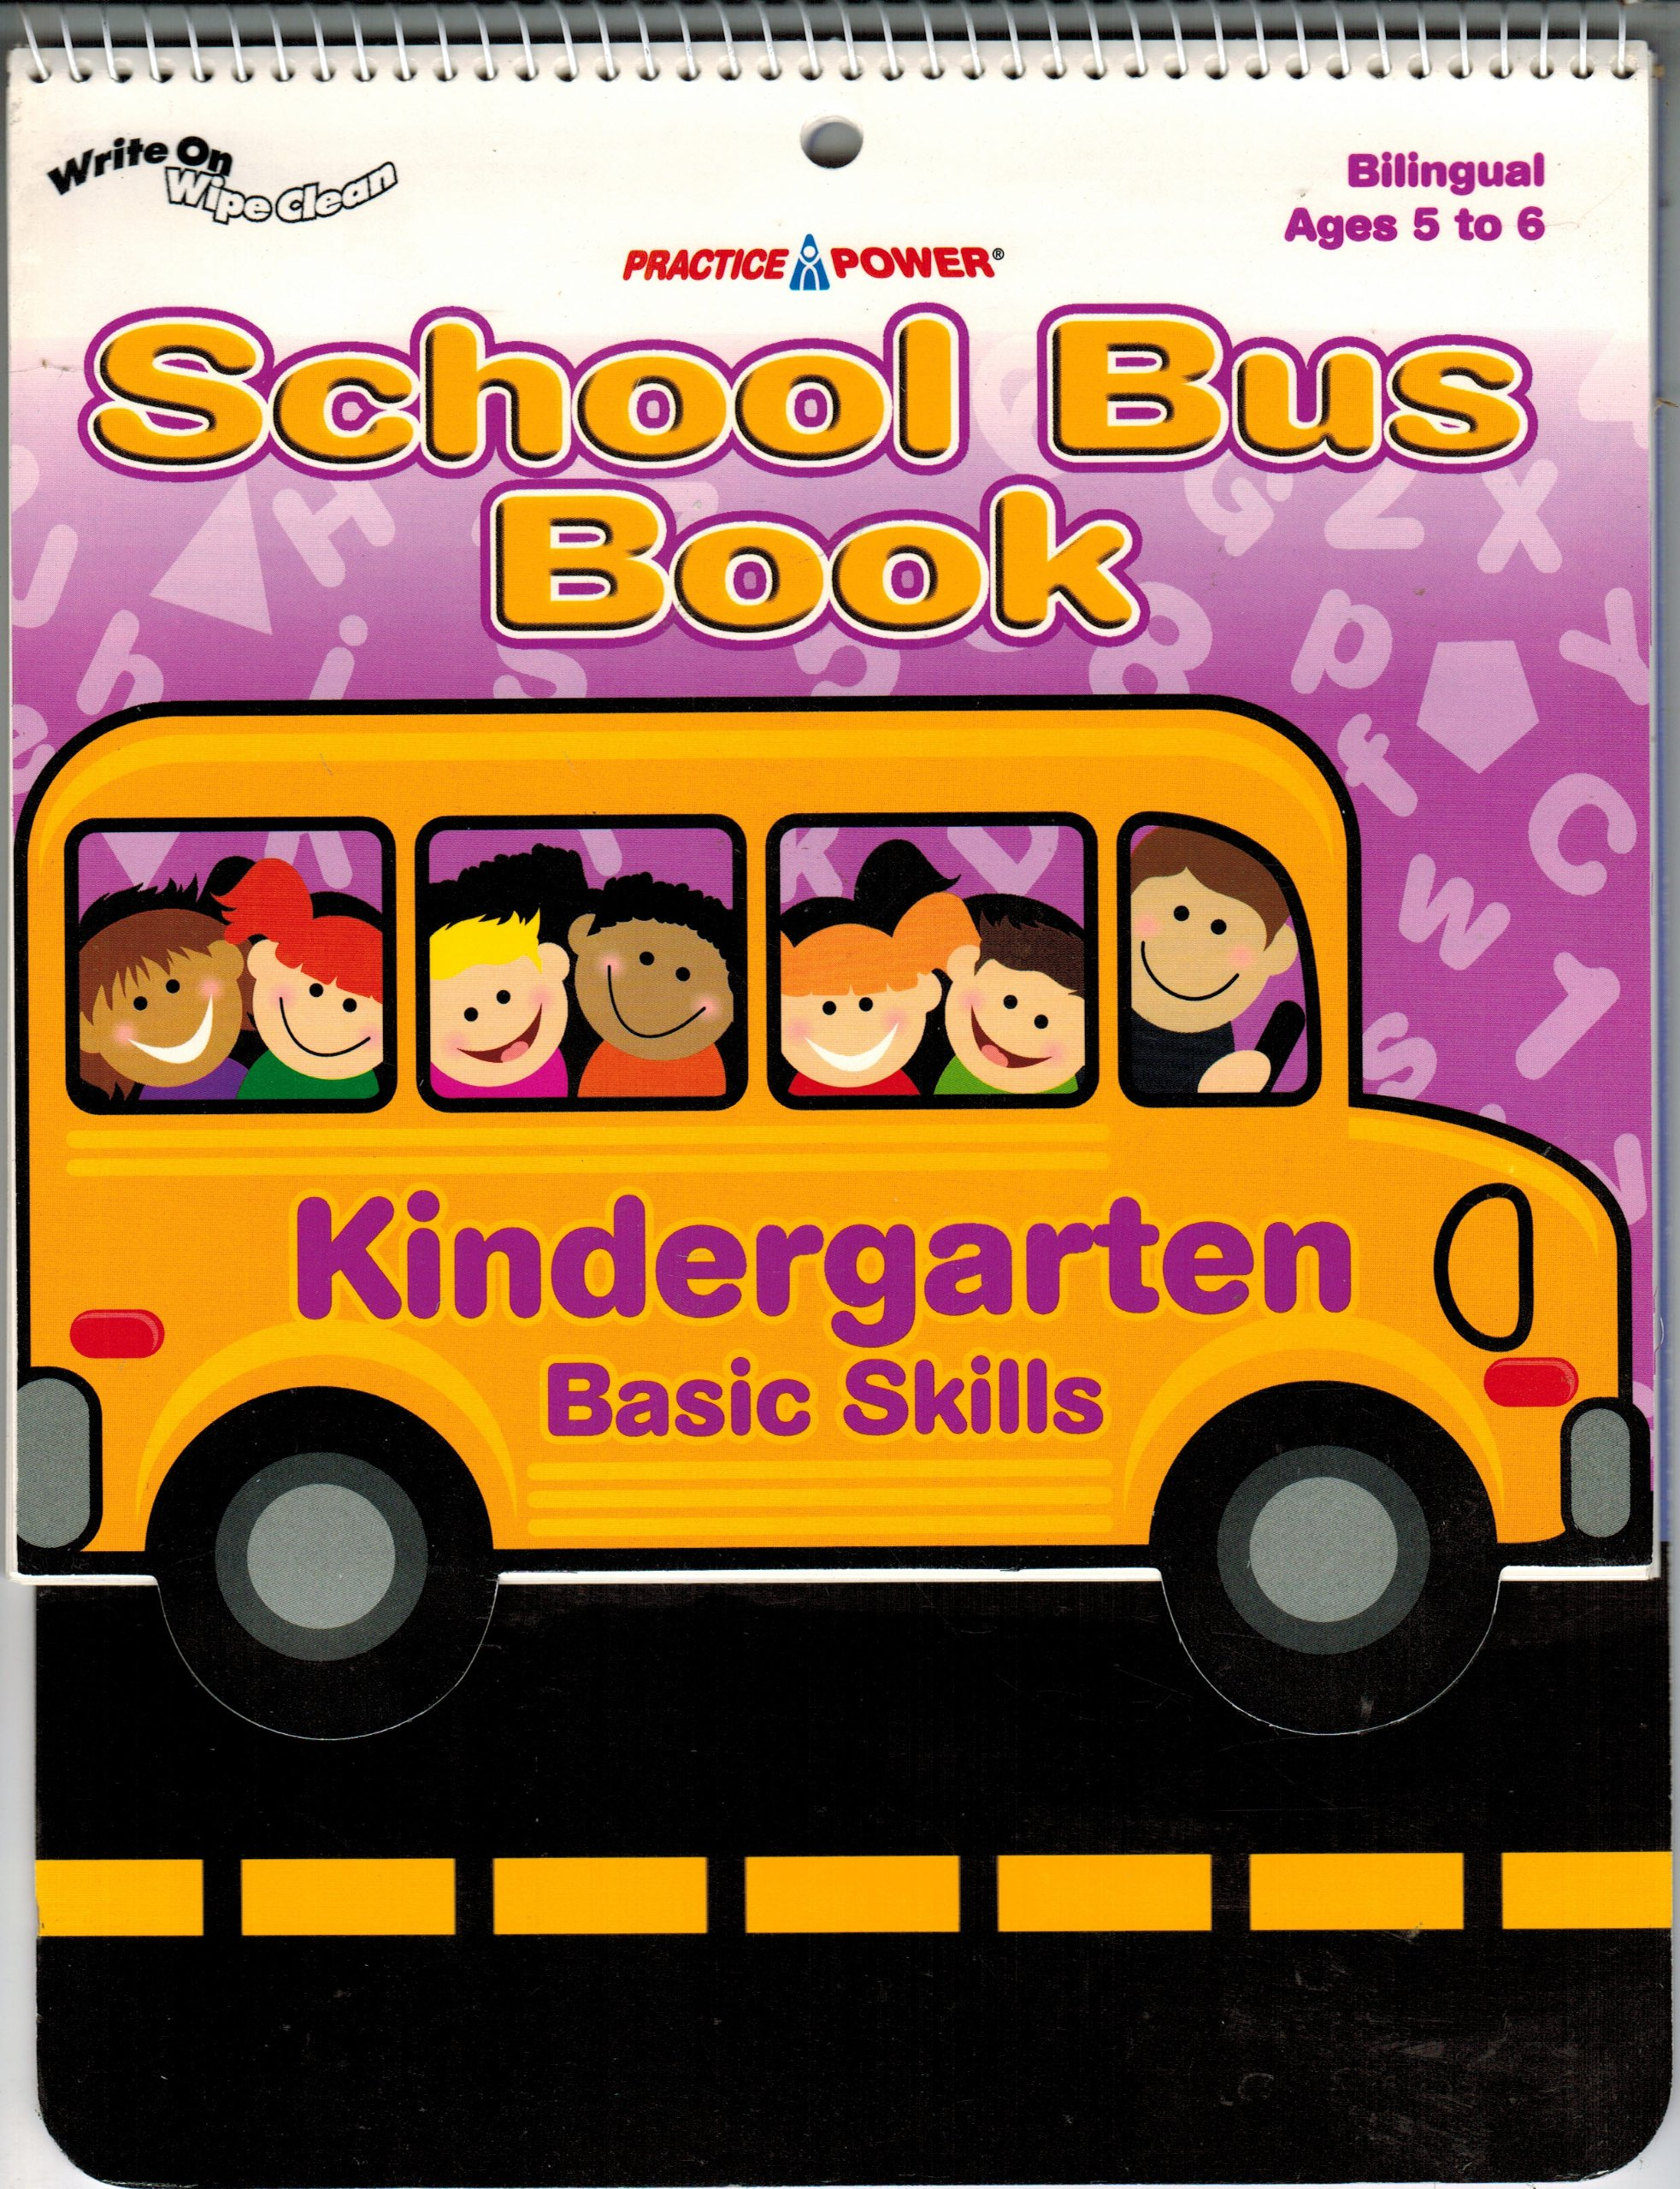 Kindergarten Basic Skills School Bus Book, Bilingual Ages 5-6, Wipe Off, Practice Power